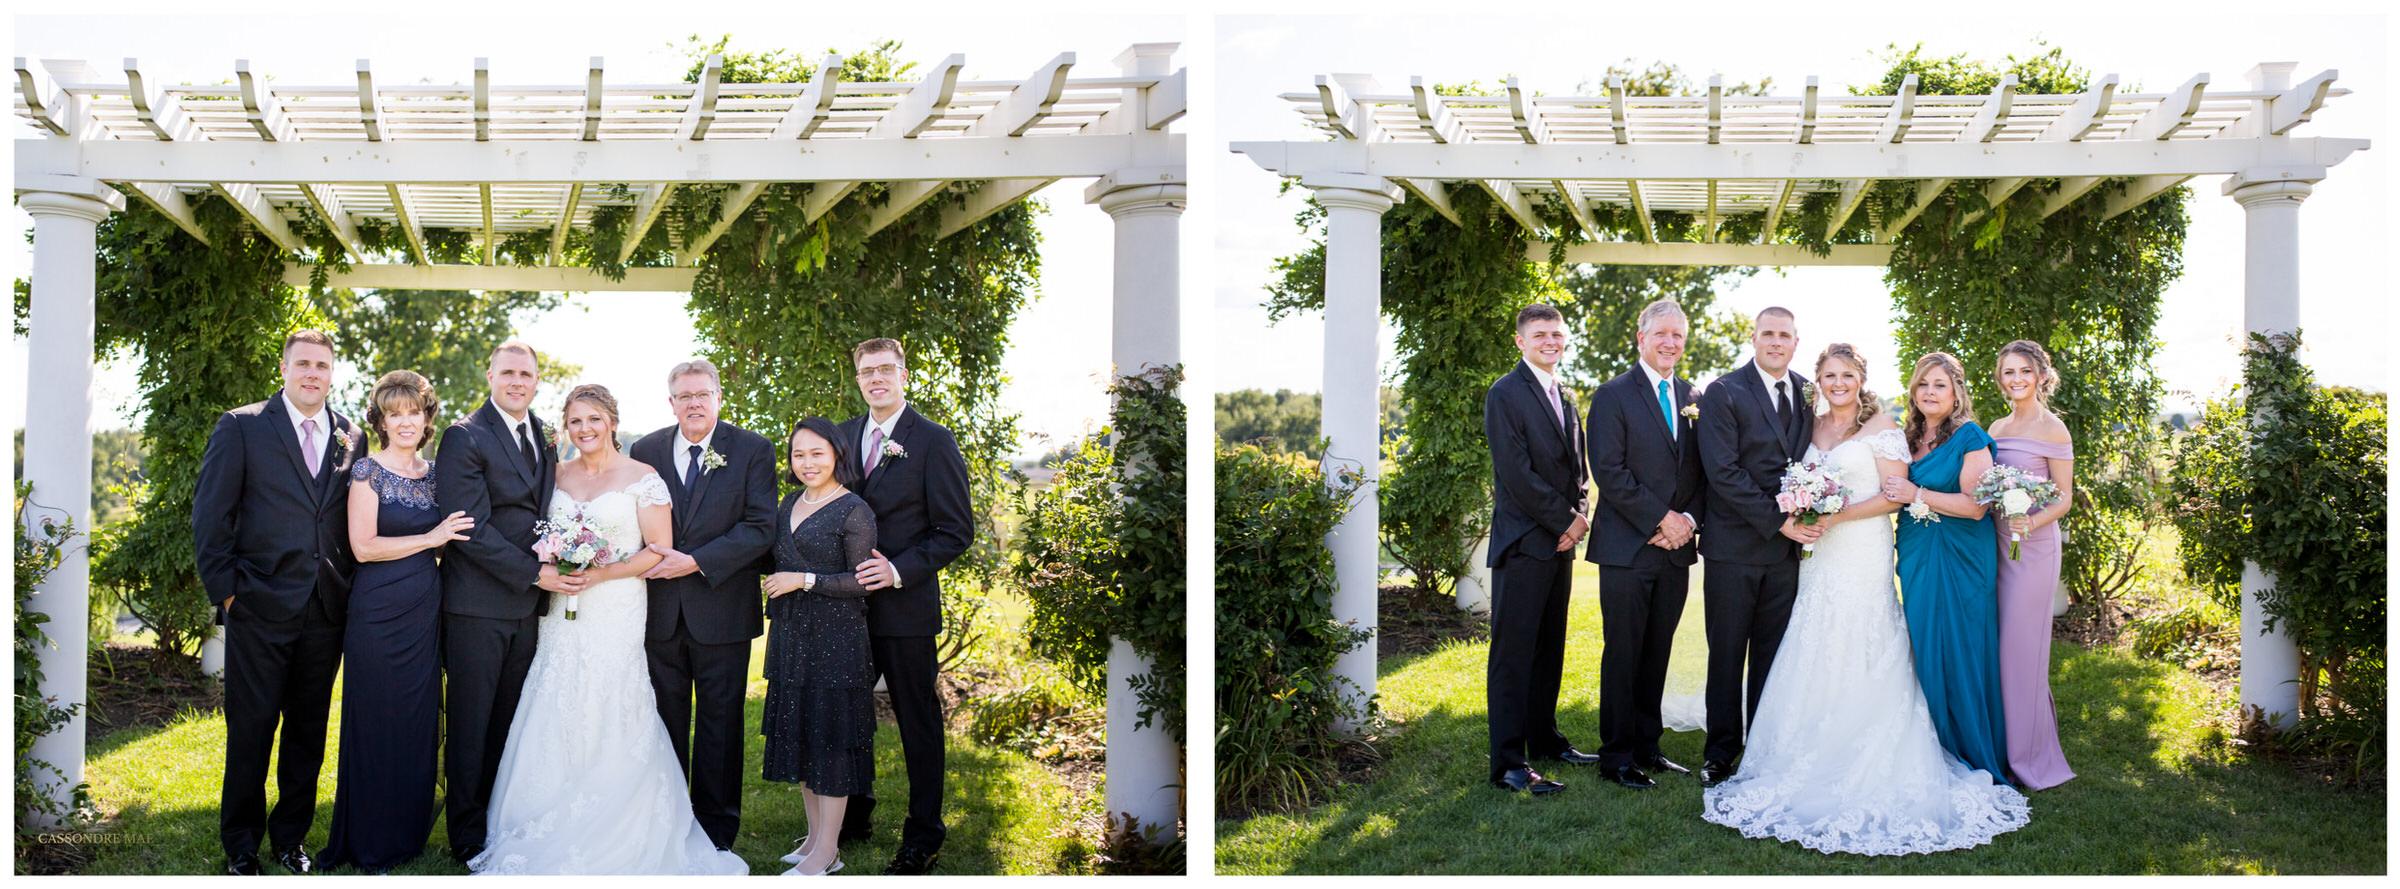 Cassondre Mae Photography The Links Wedding Photographer 16.jpg